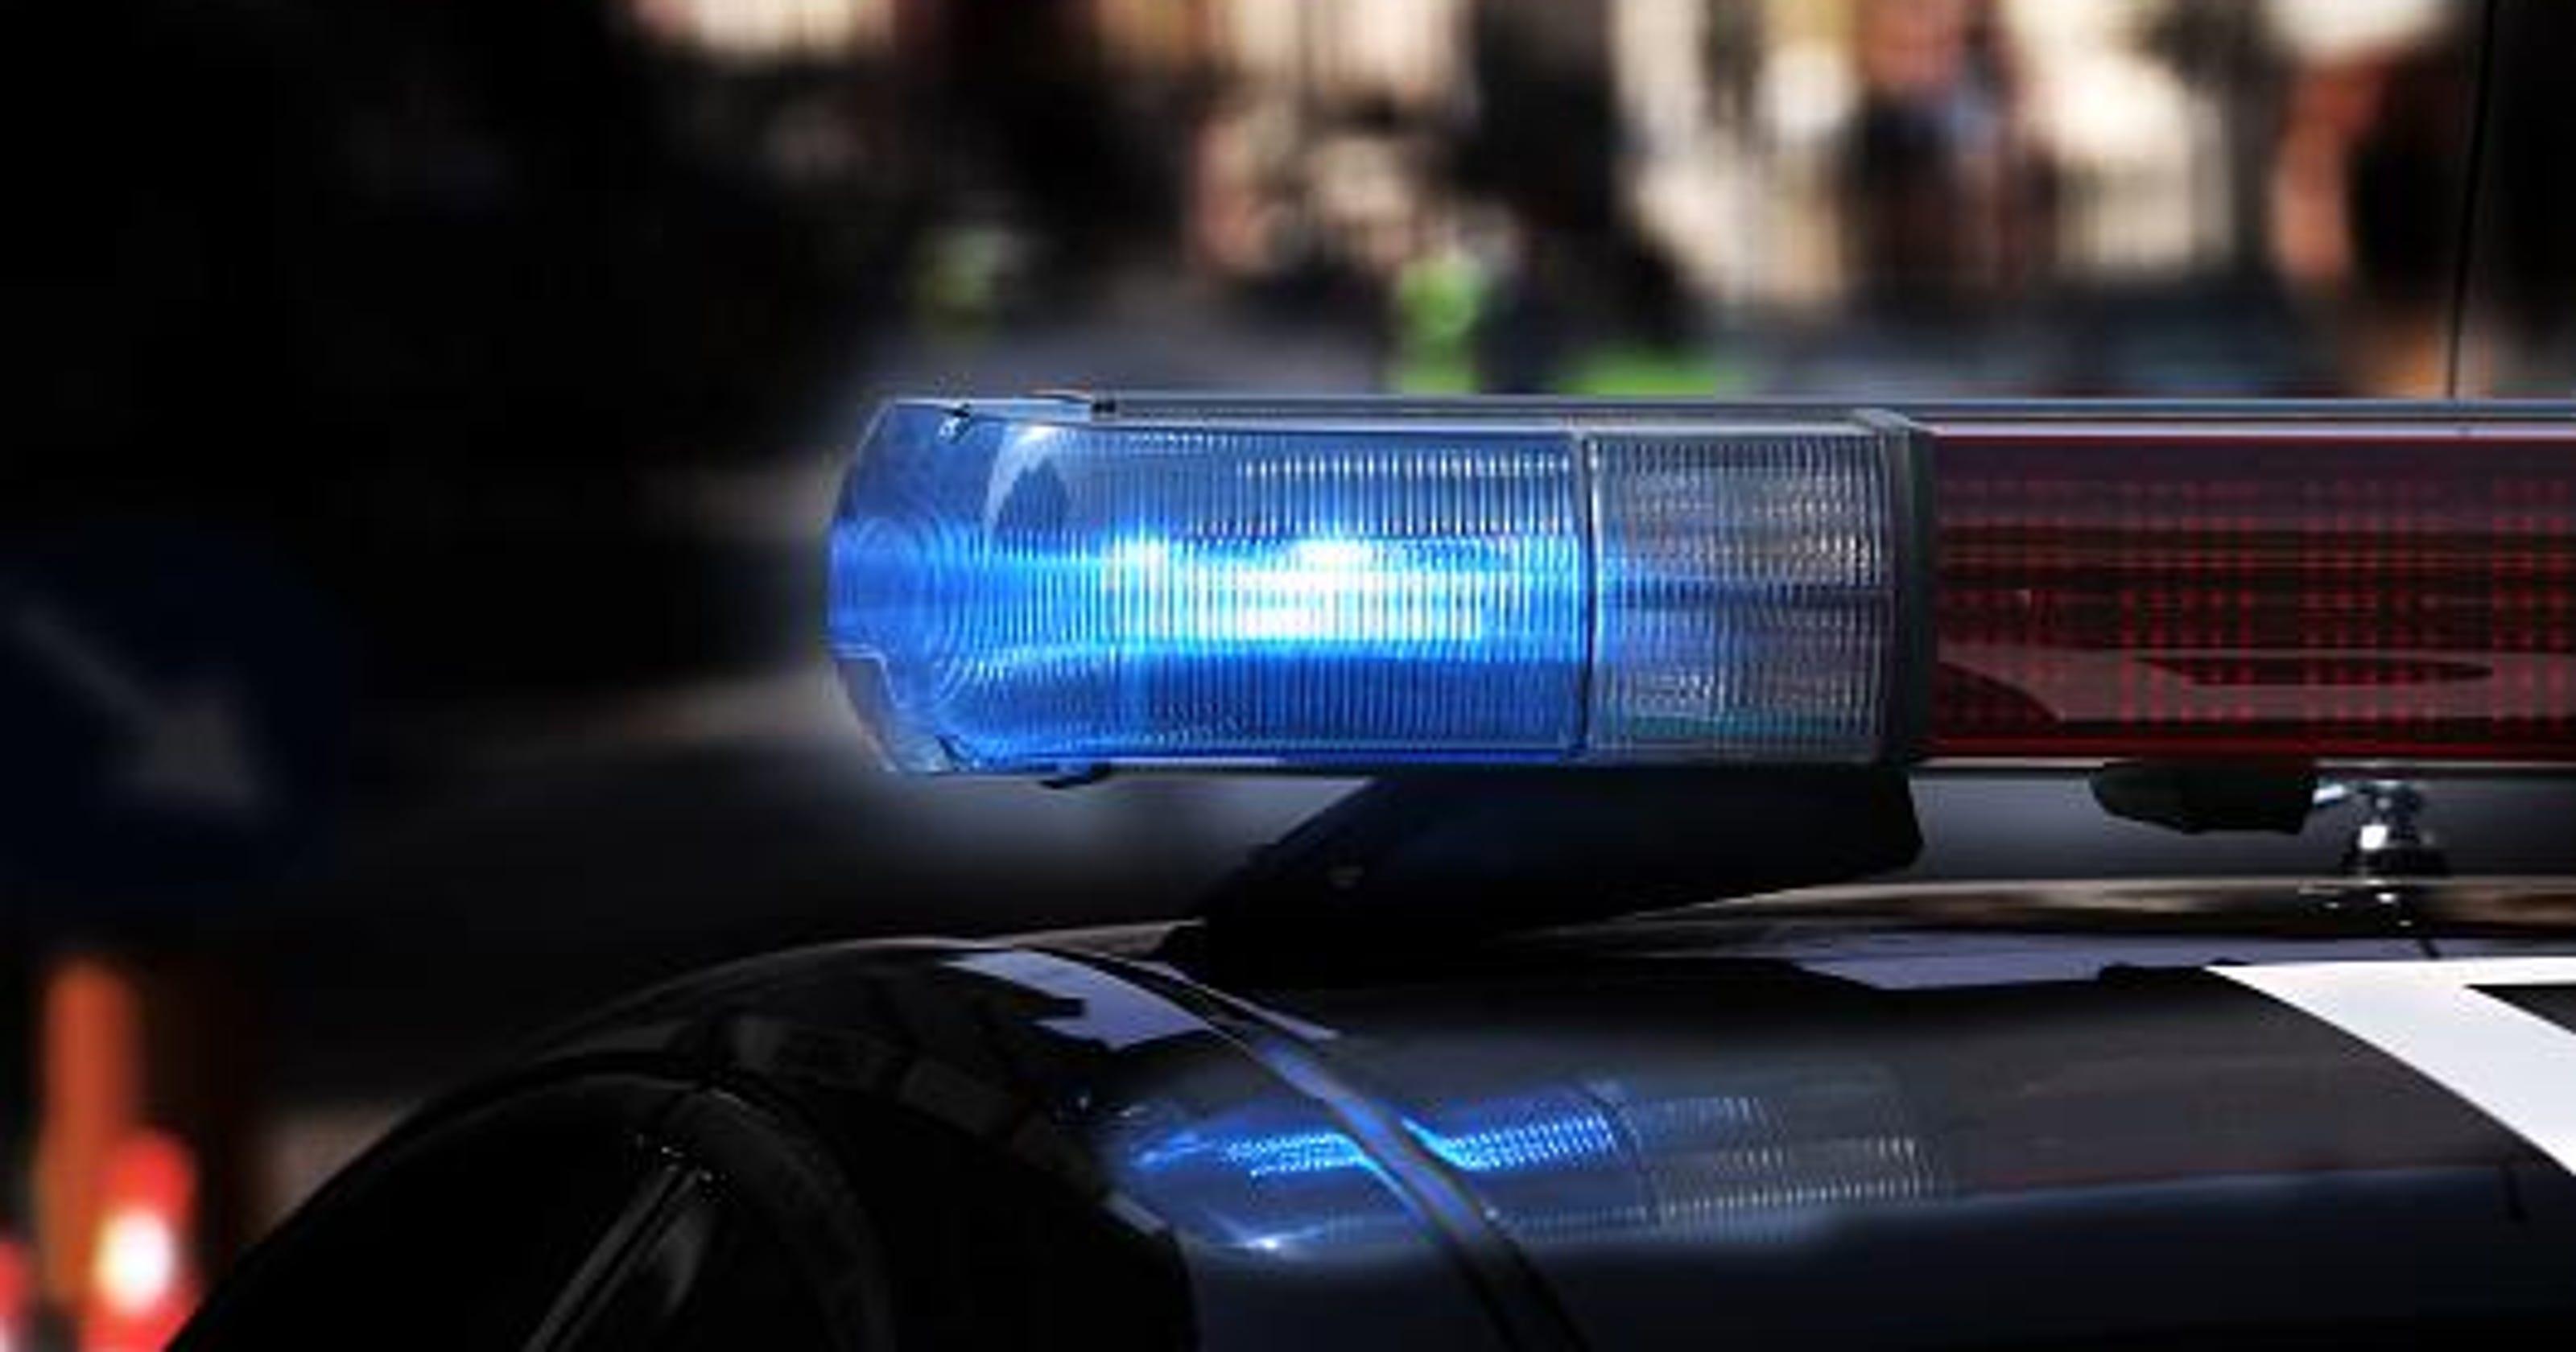 Manitowoc US 151 crash: Woman, 17, dies after crossing